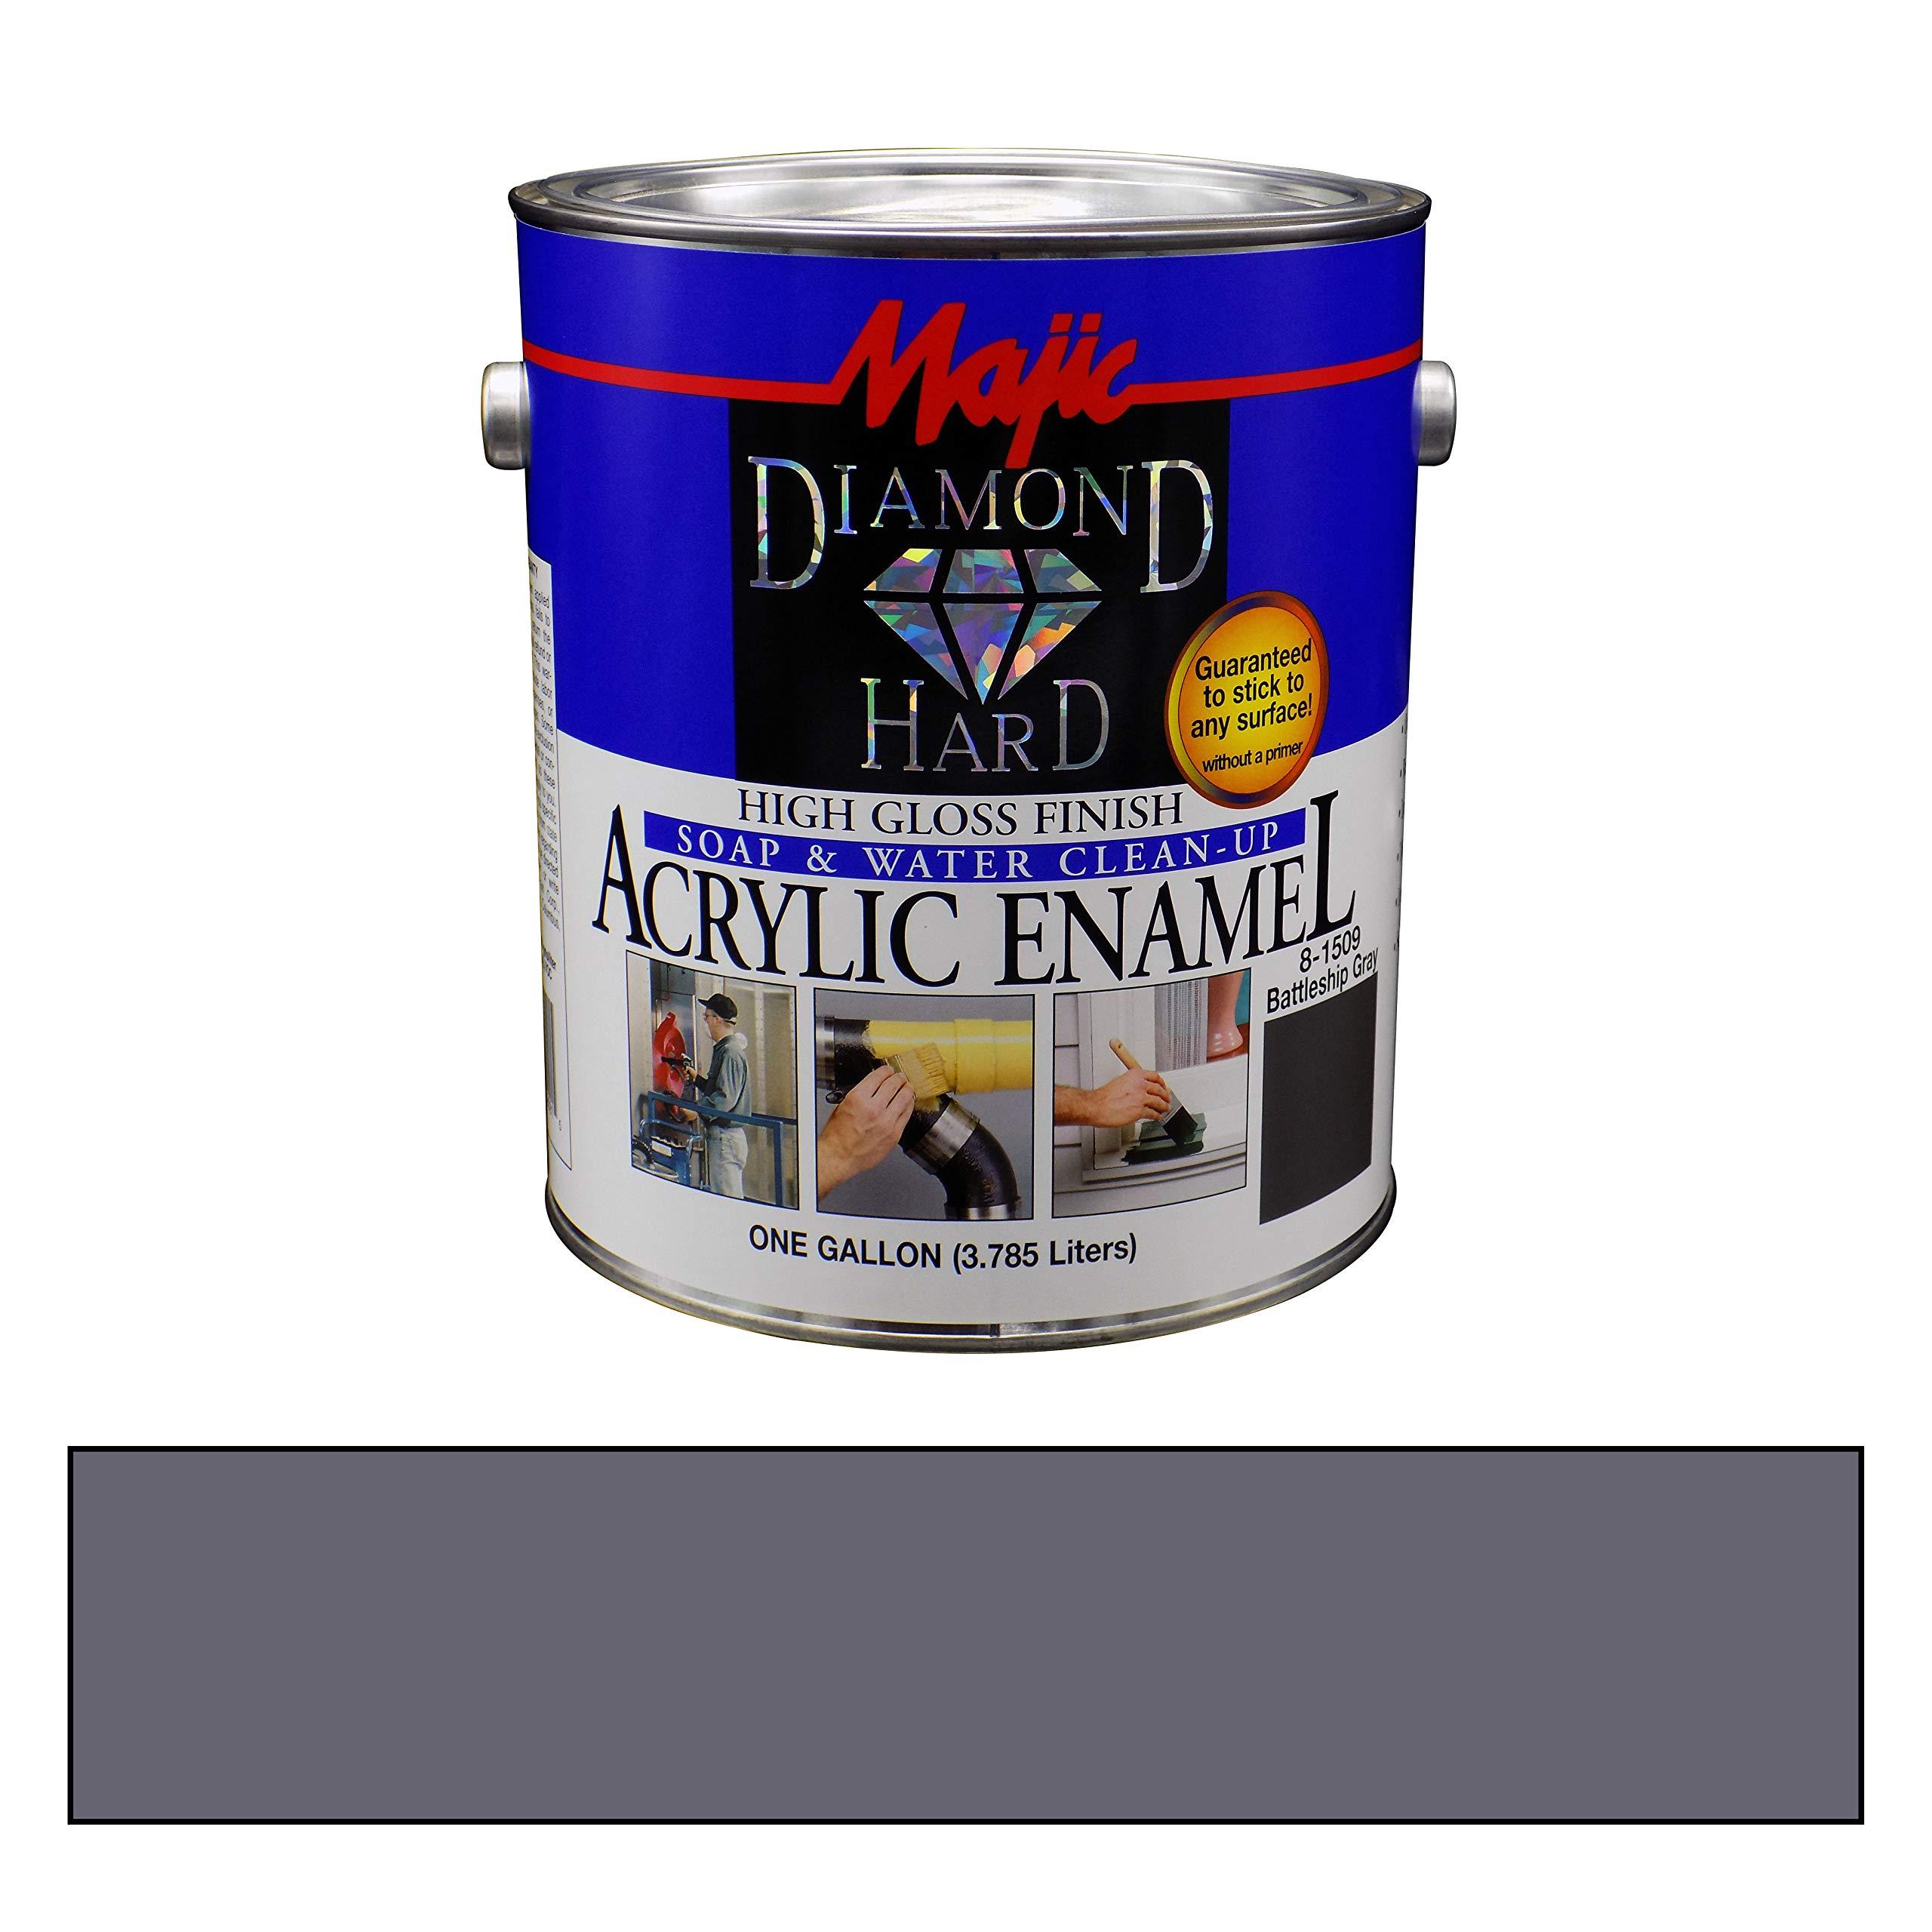 Majic Paints 8-1509-1 Diamond Hard Acrylic Enamel High Gloss Paint, 128 oz / 1-Gallon, Battleship